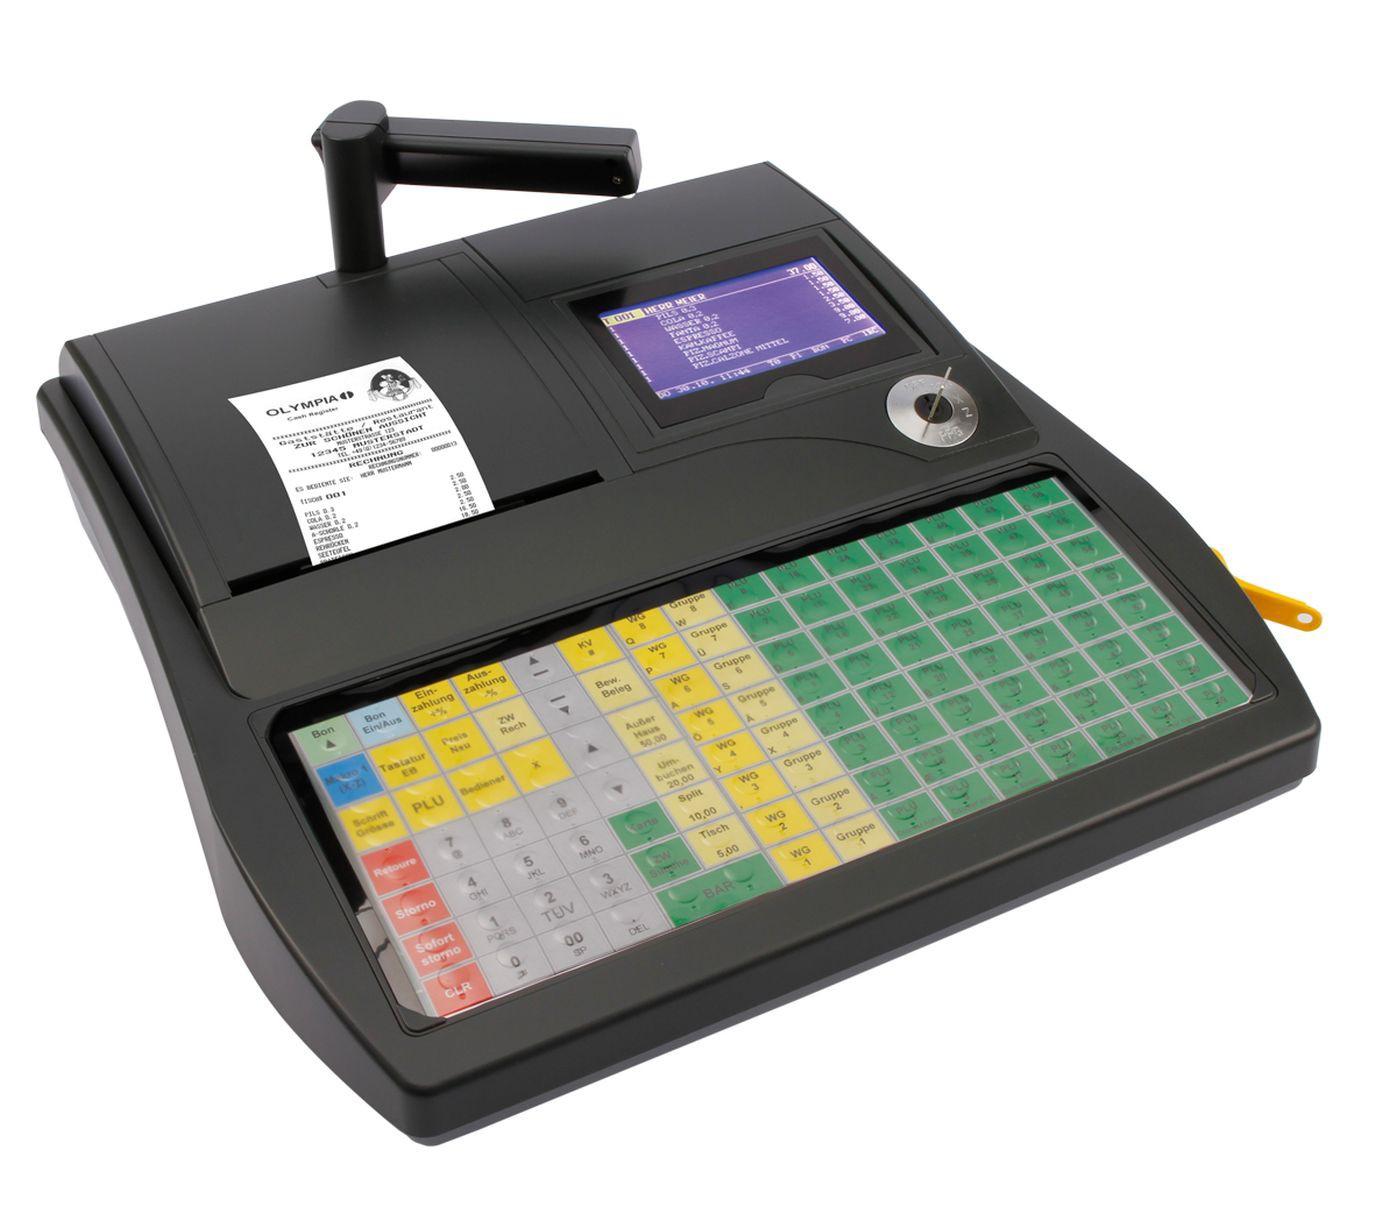 OLYMPIA CM 980 F Registrierkasse mit Flachtastatur